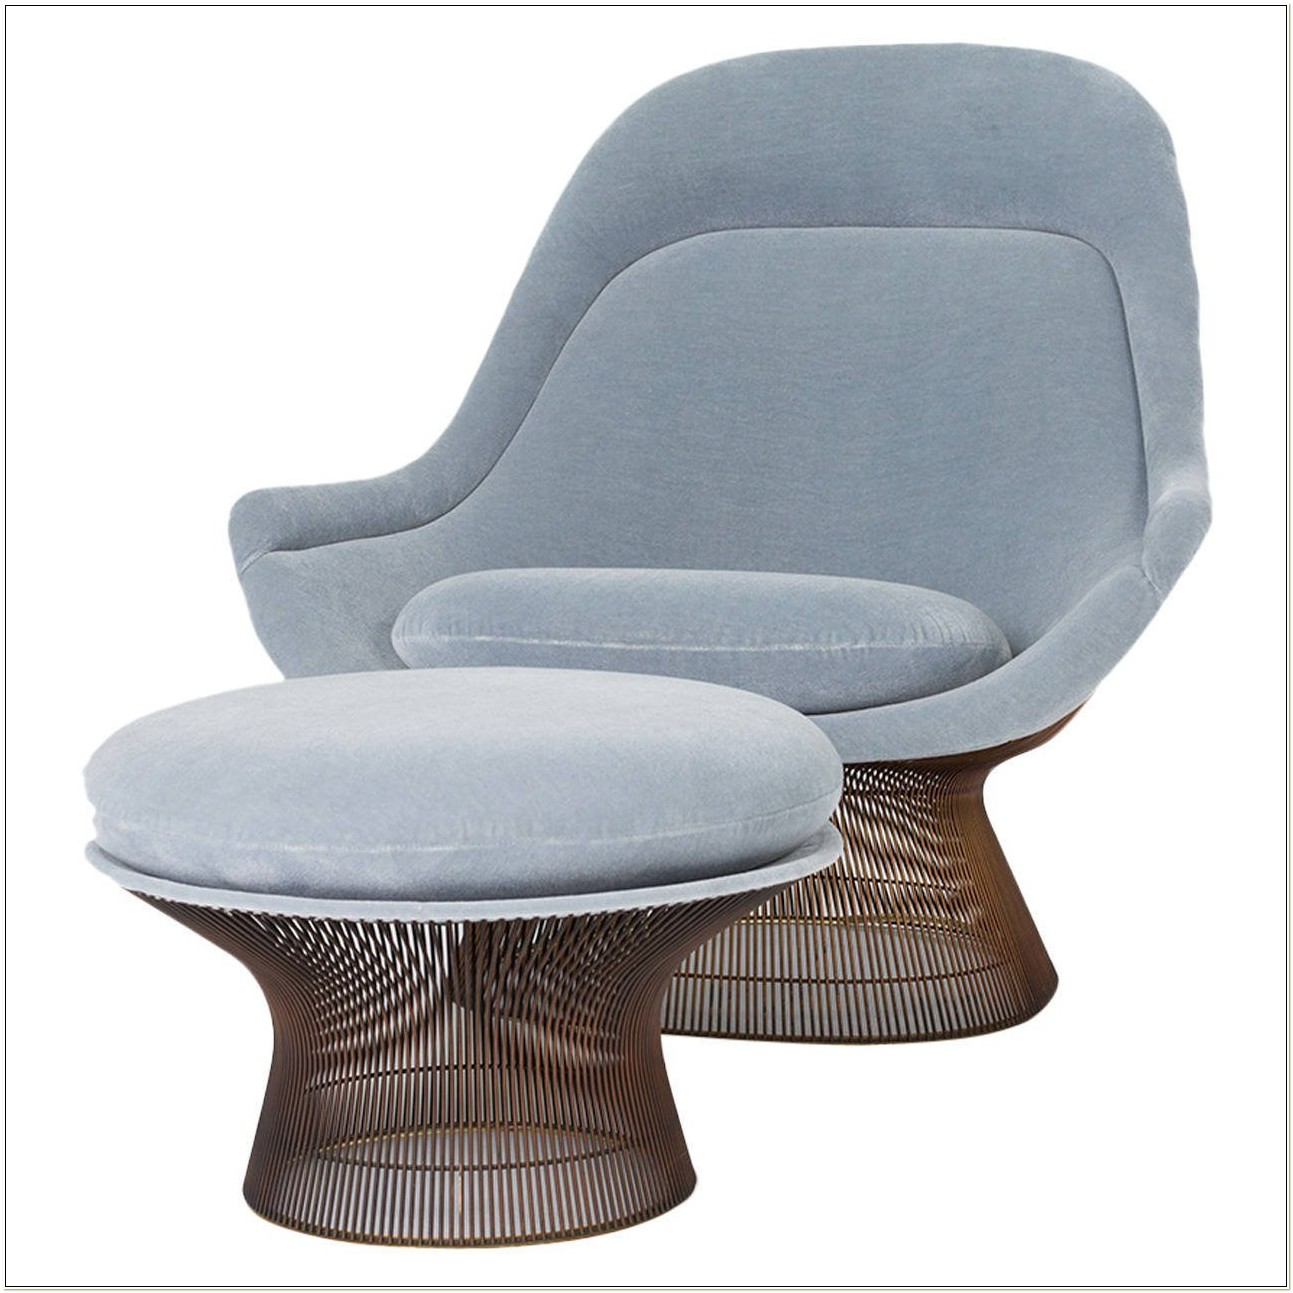 Warren Platner Lounge Chair And Ottoman